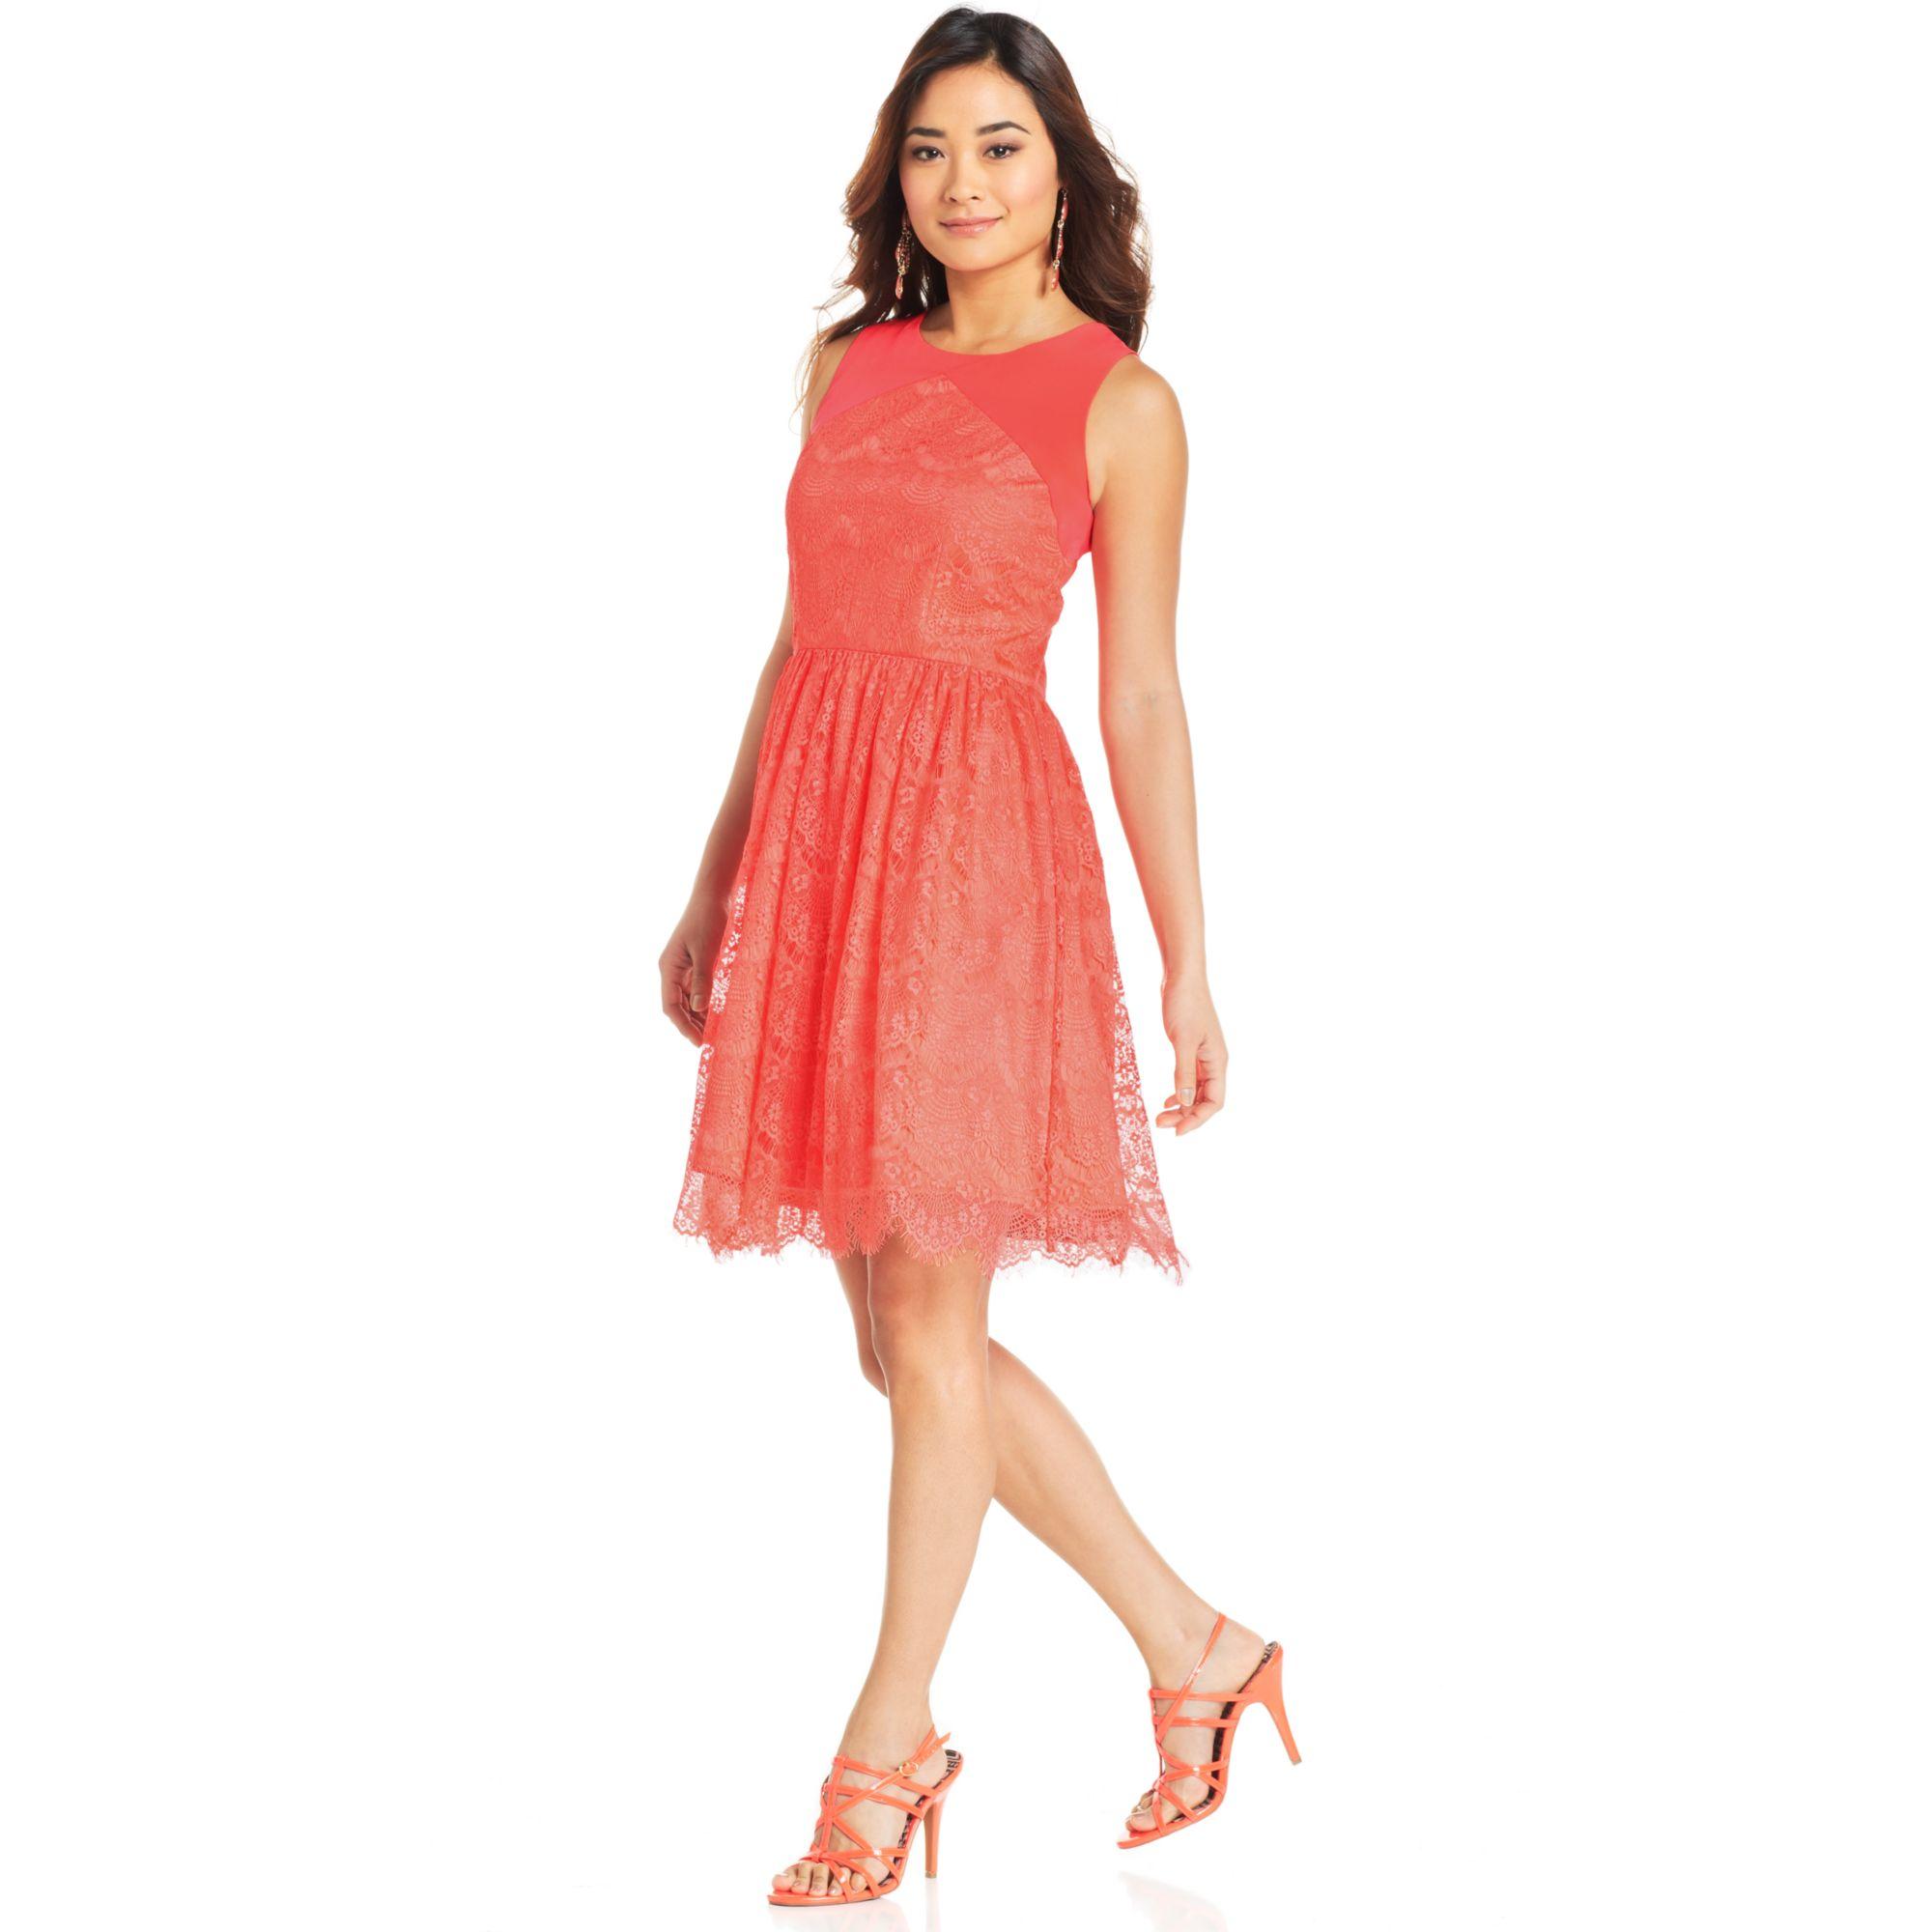 dc13269e5dcd Jessica Simpson Sleeveless Cutout Lace Dress in Orange - Lyst